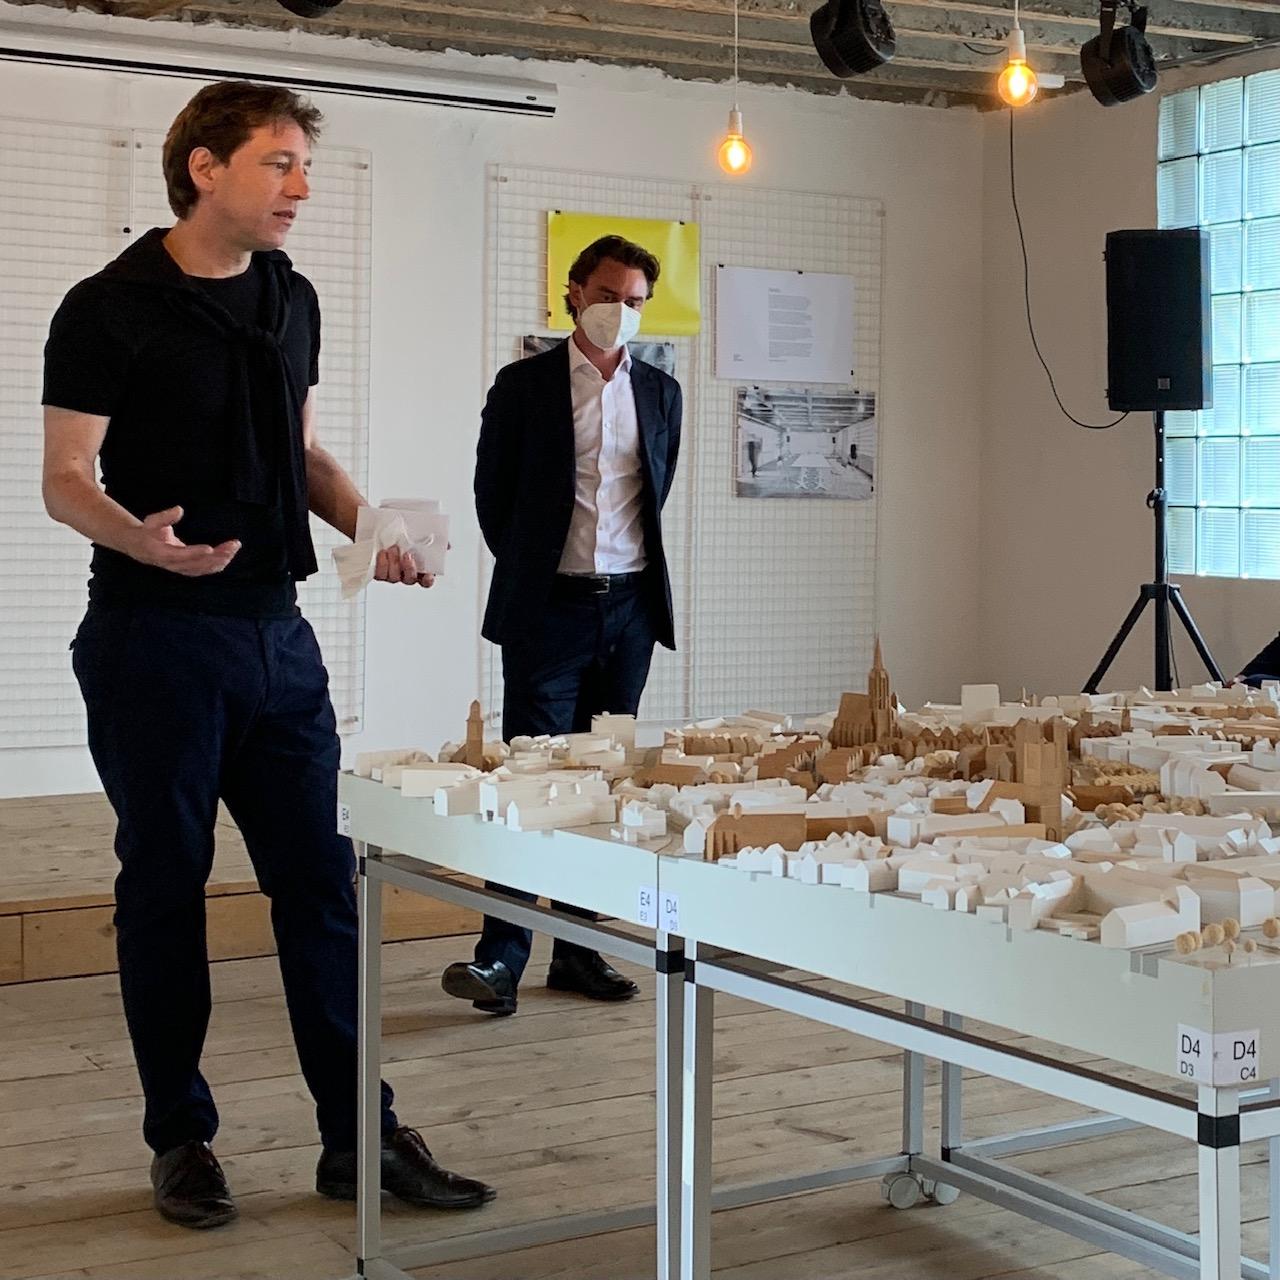 Münster Modell in der Trafostation: Julian Latzko (Bundesstiftung Baukultur) und Stefan Rethfeld (Münster Modell) - am Stadtmodell - Foto: Martin Schmidt